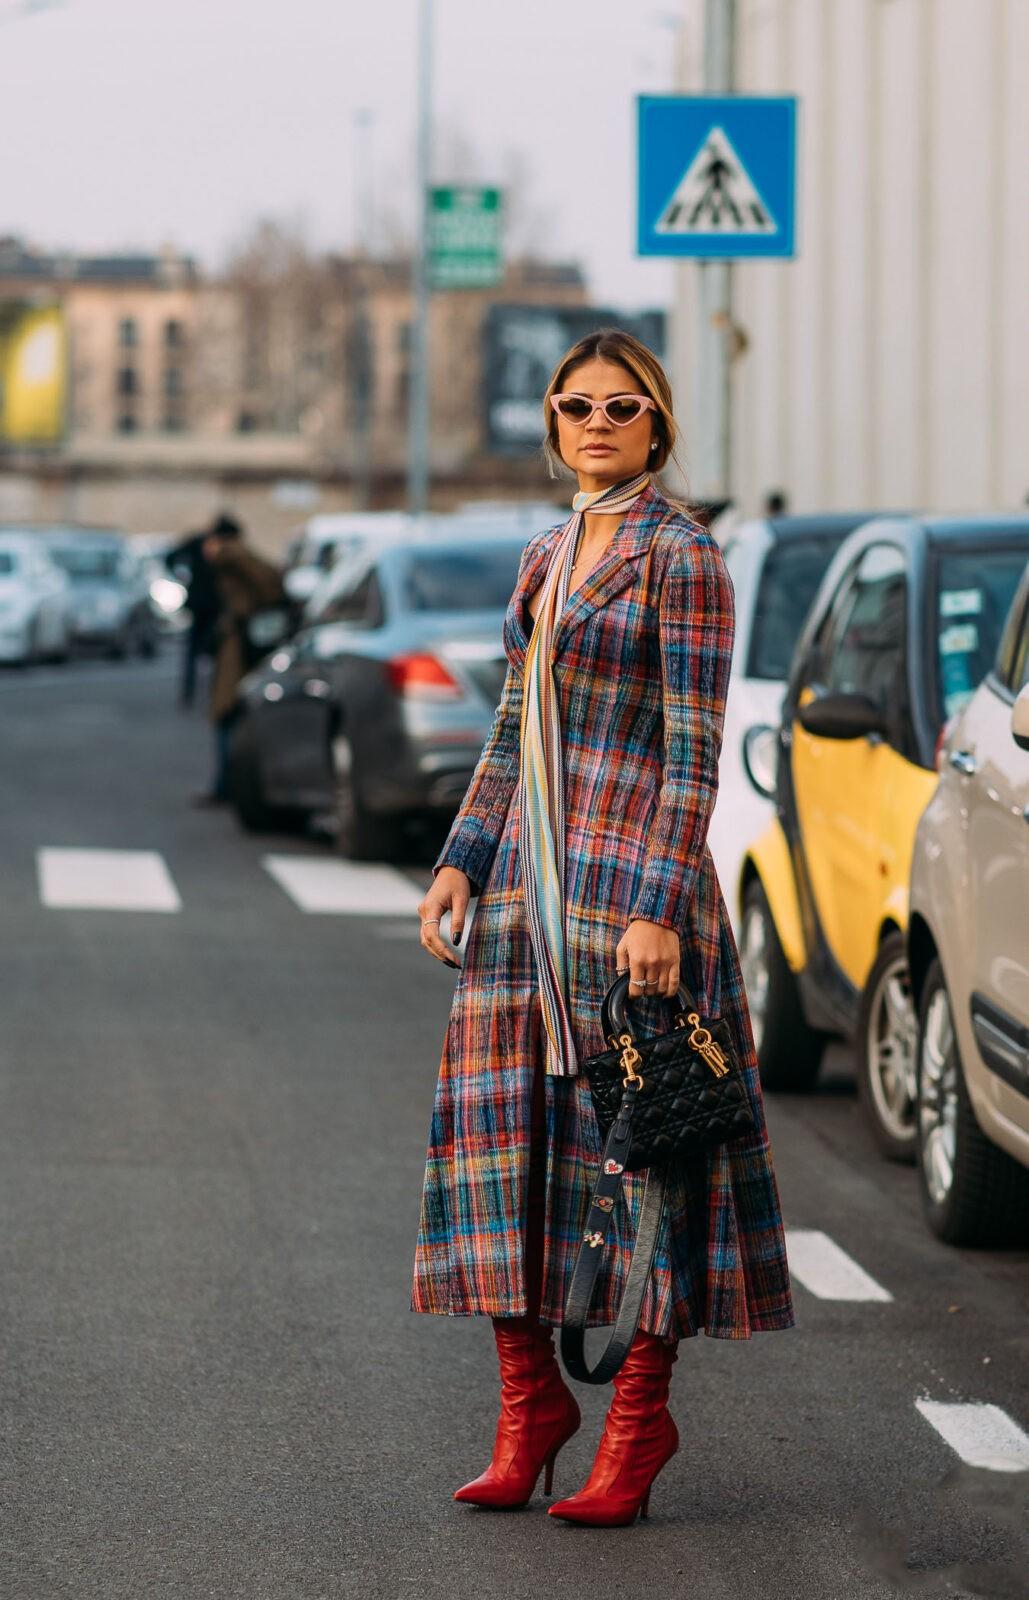 Thassia Naves tartan stylebook editseven